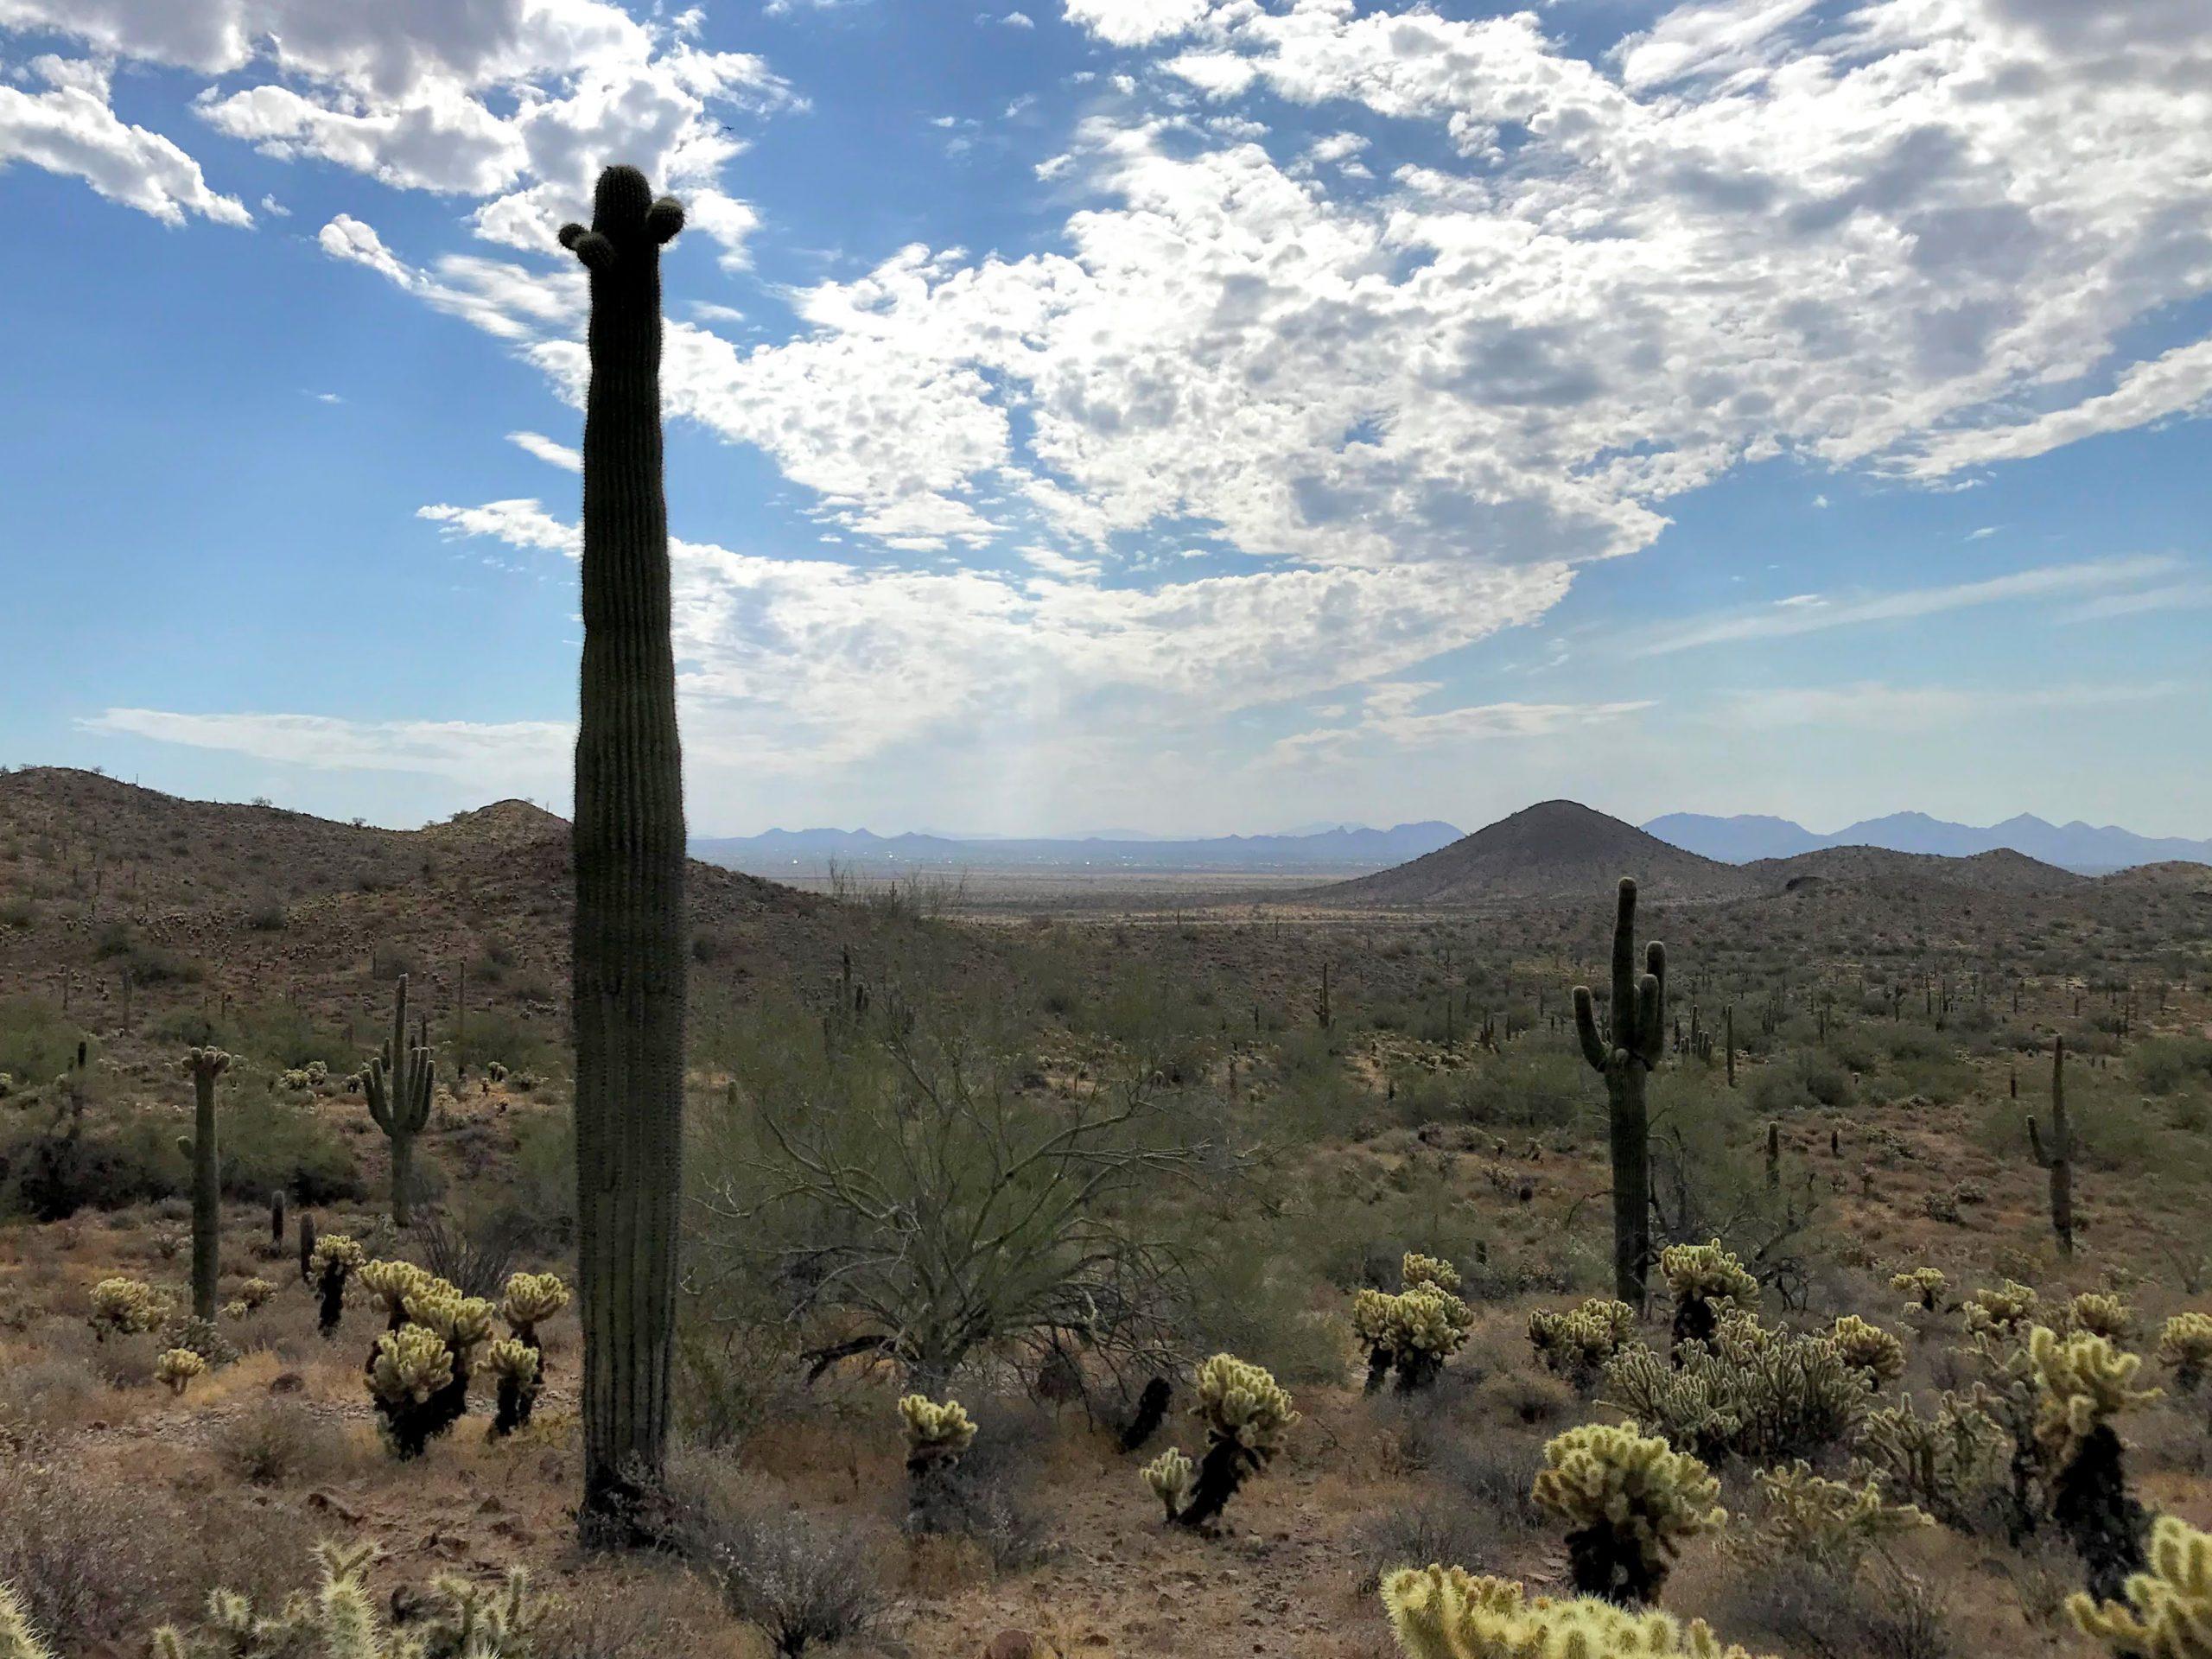 Desert Vista Trailhead Hikes, Phoenix Sonoran Preserve more McDowells views